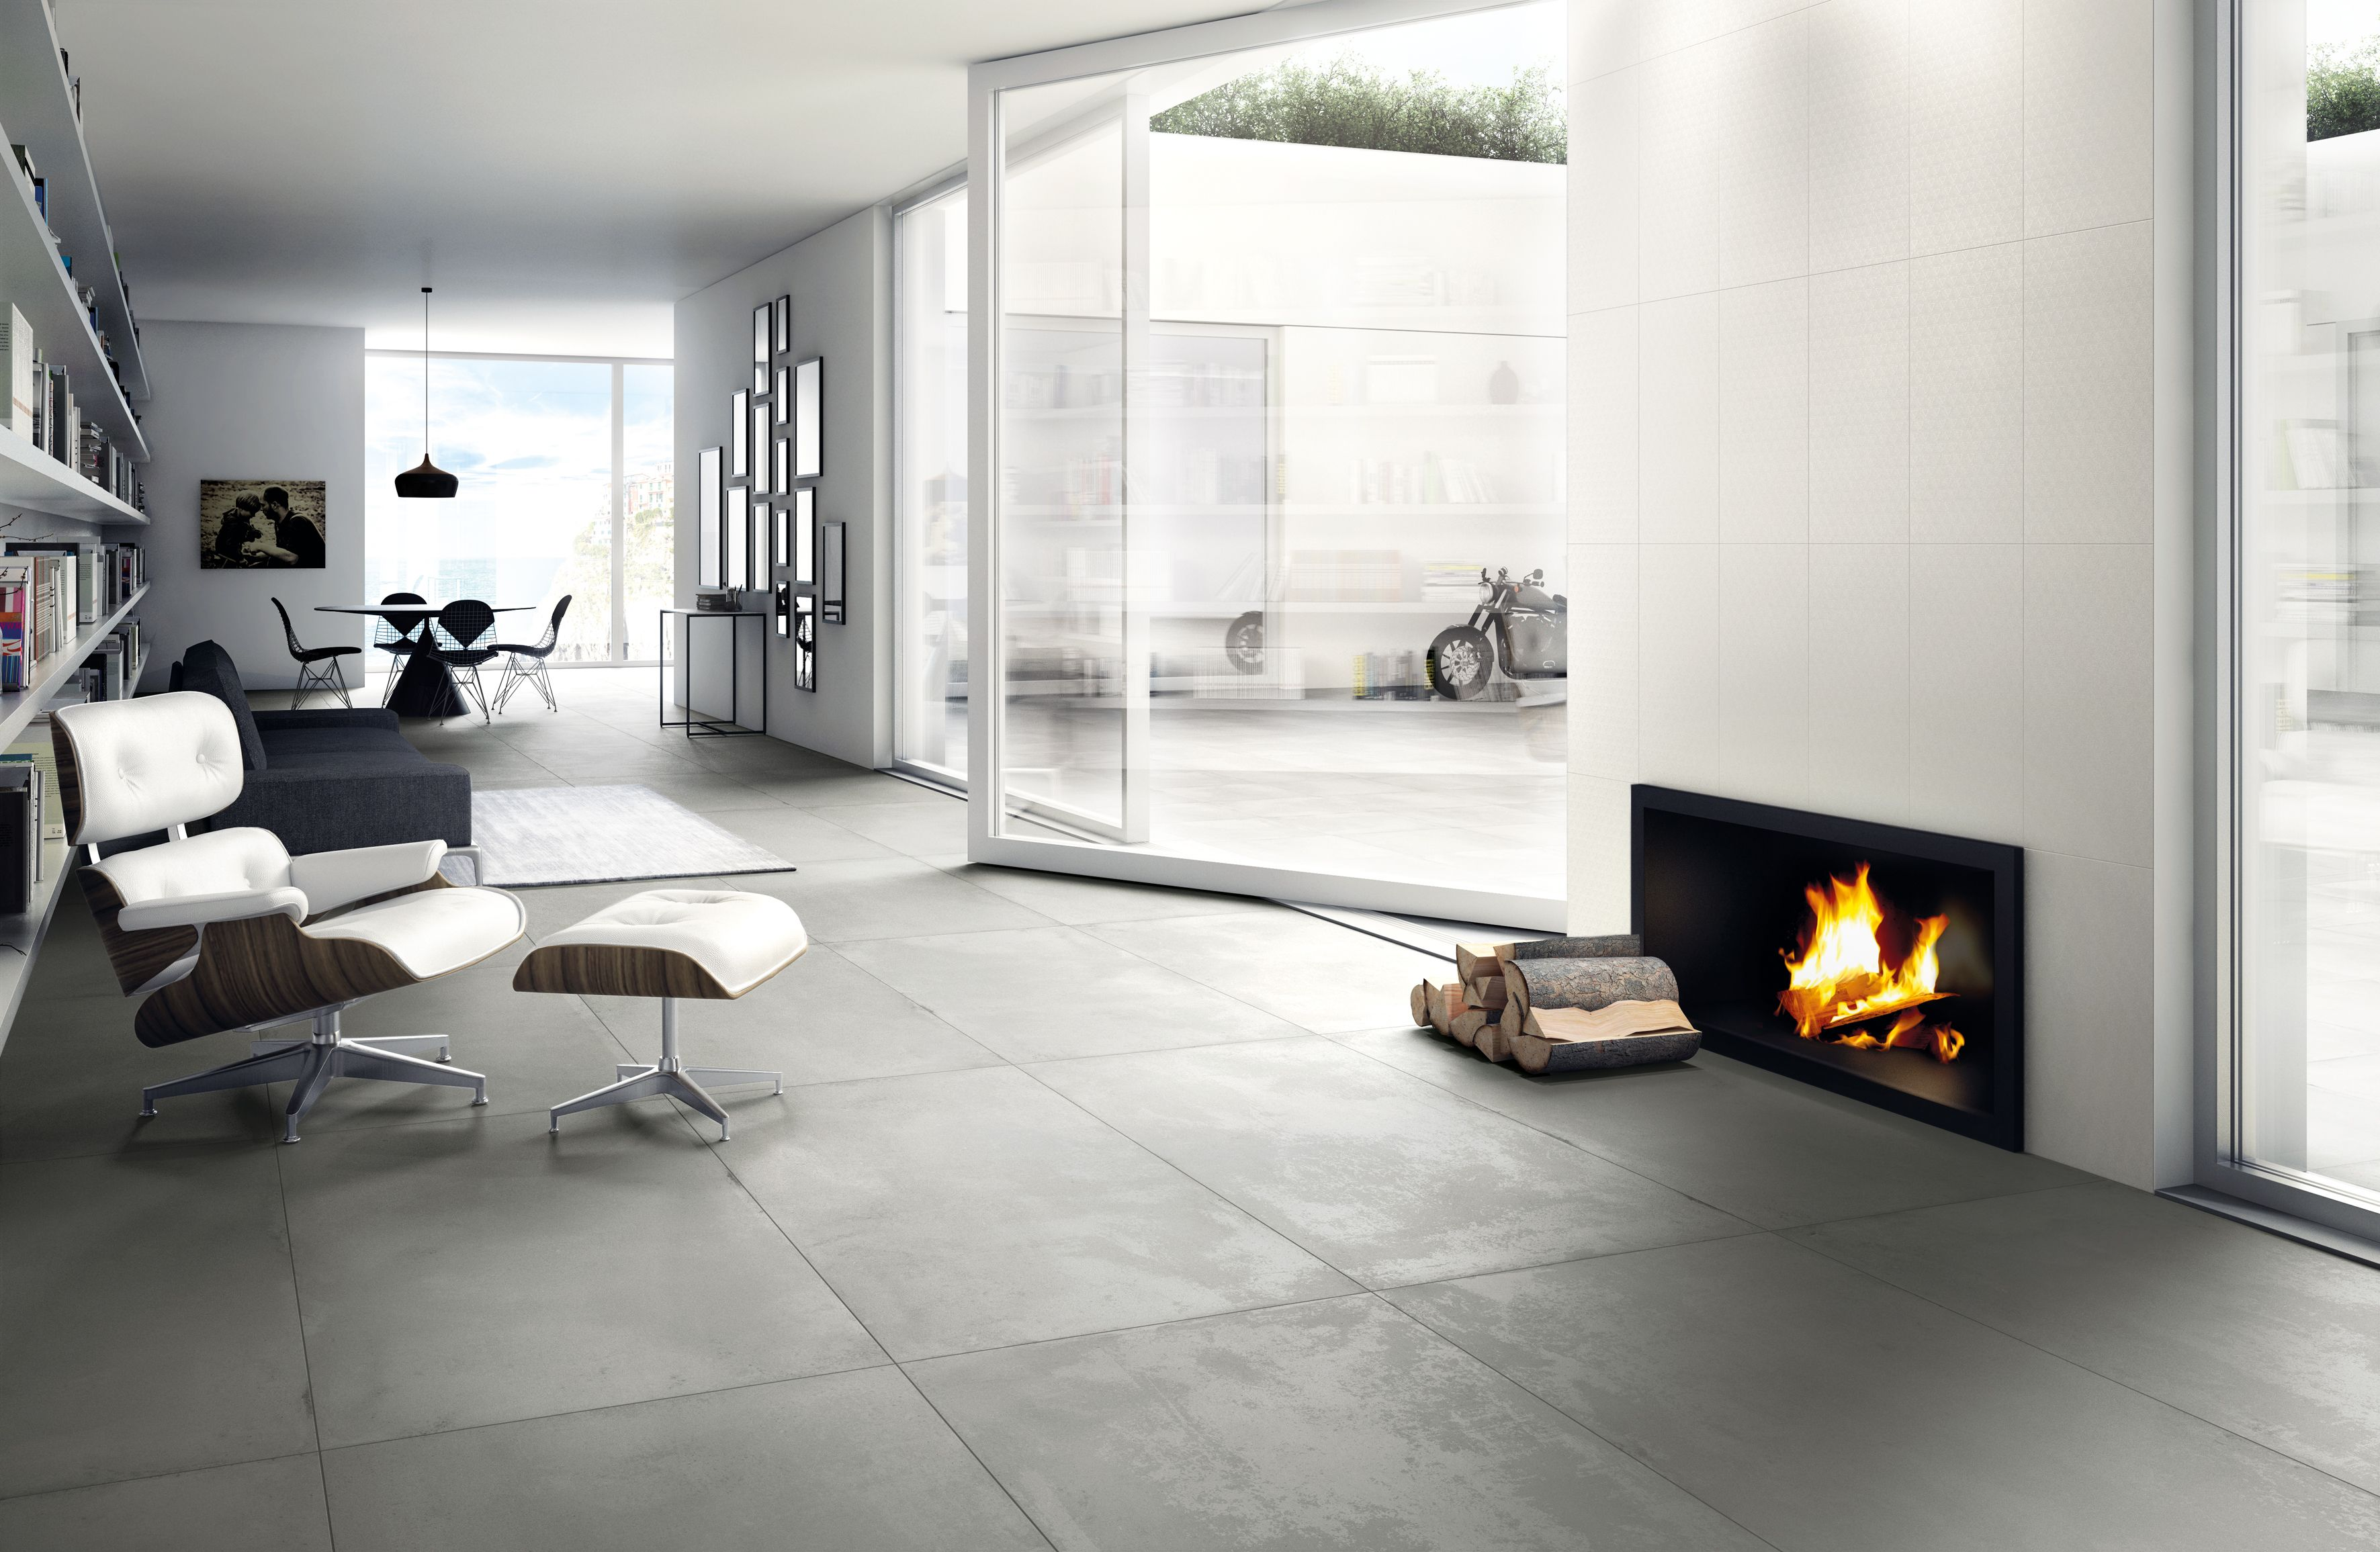 Carrelage Interieur Effet Beton Use 80x160 Gris Naturel Rectifie